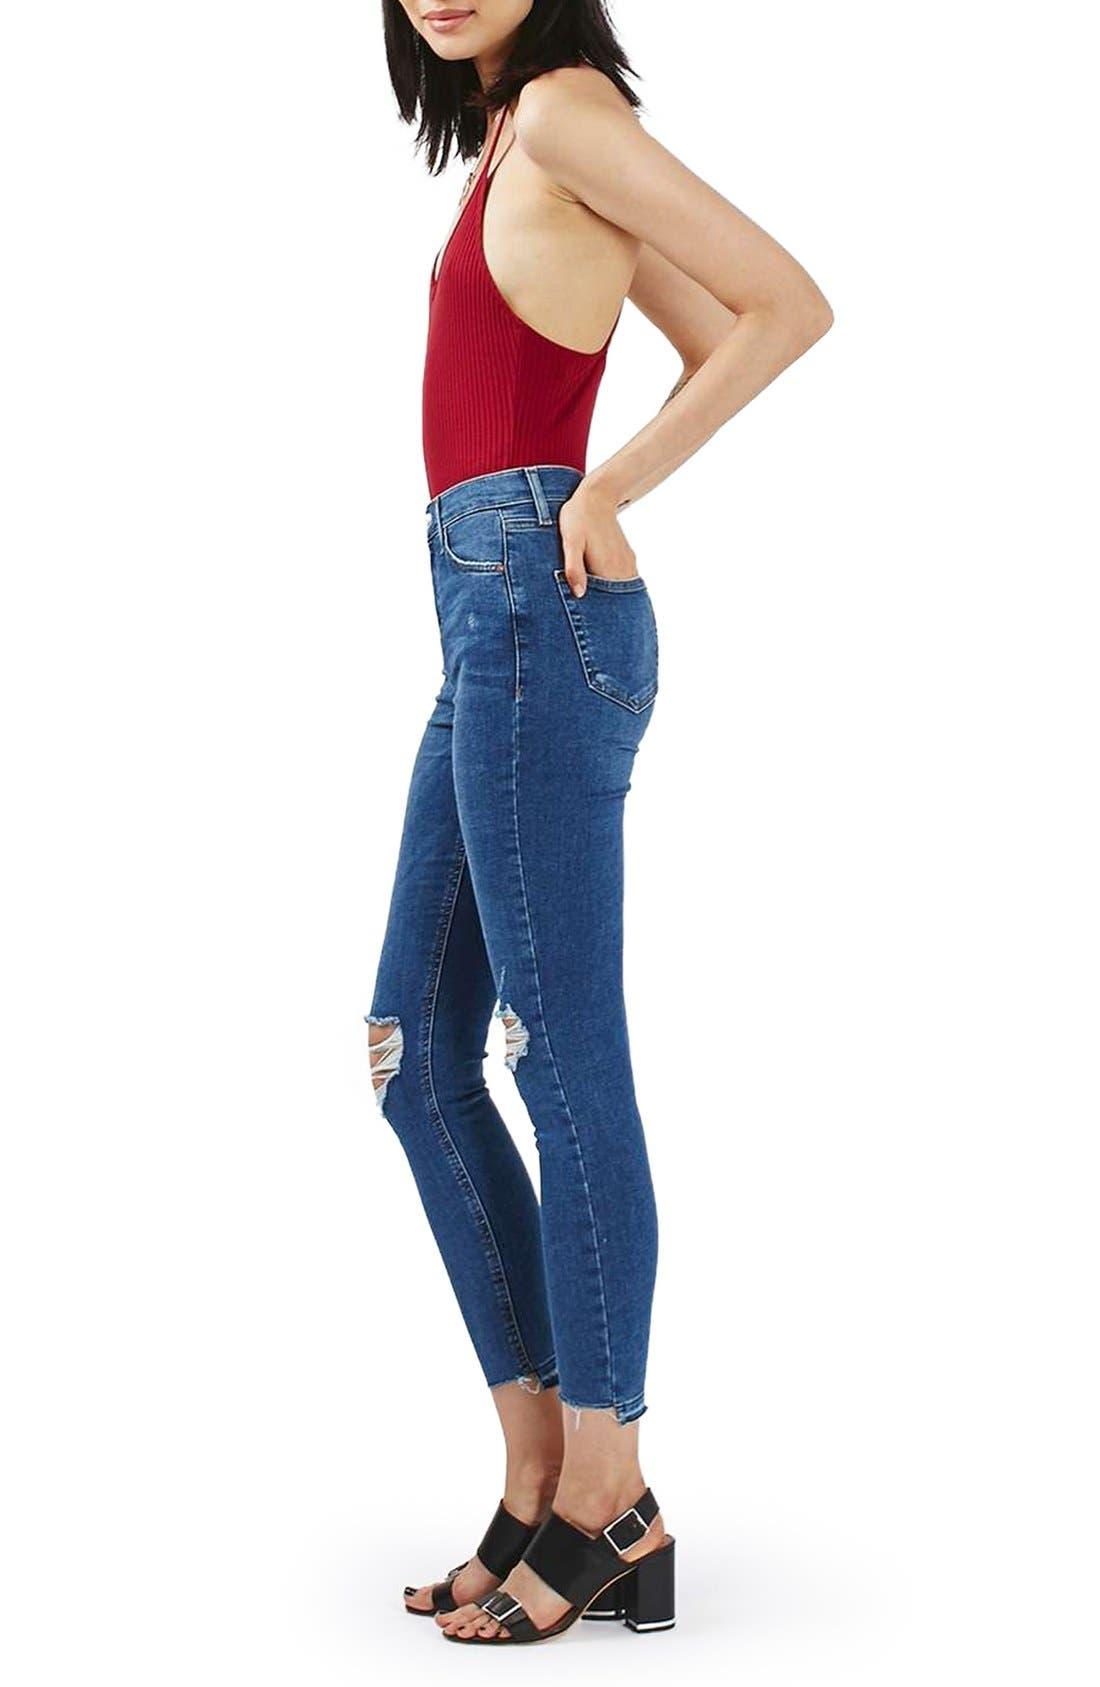 Alternate Image 1 Selected - Topshp Cross Back Plunge Bodysuit (Petite)